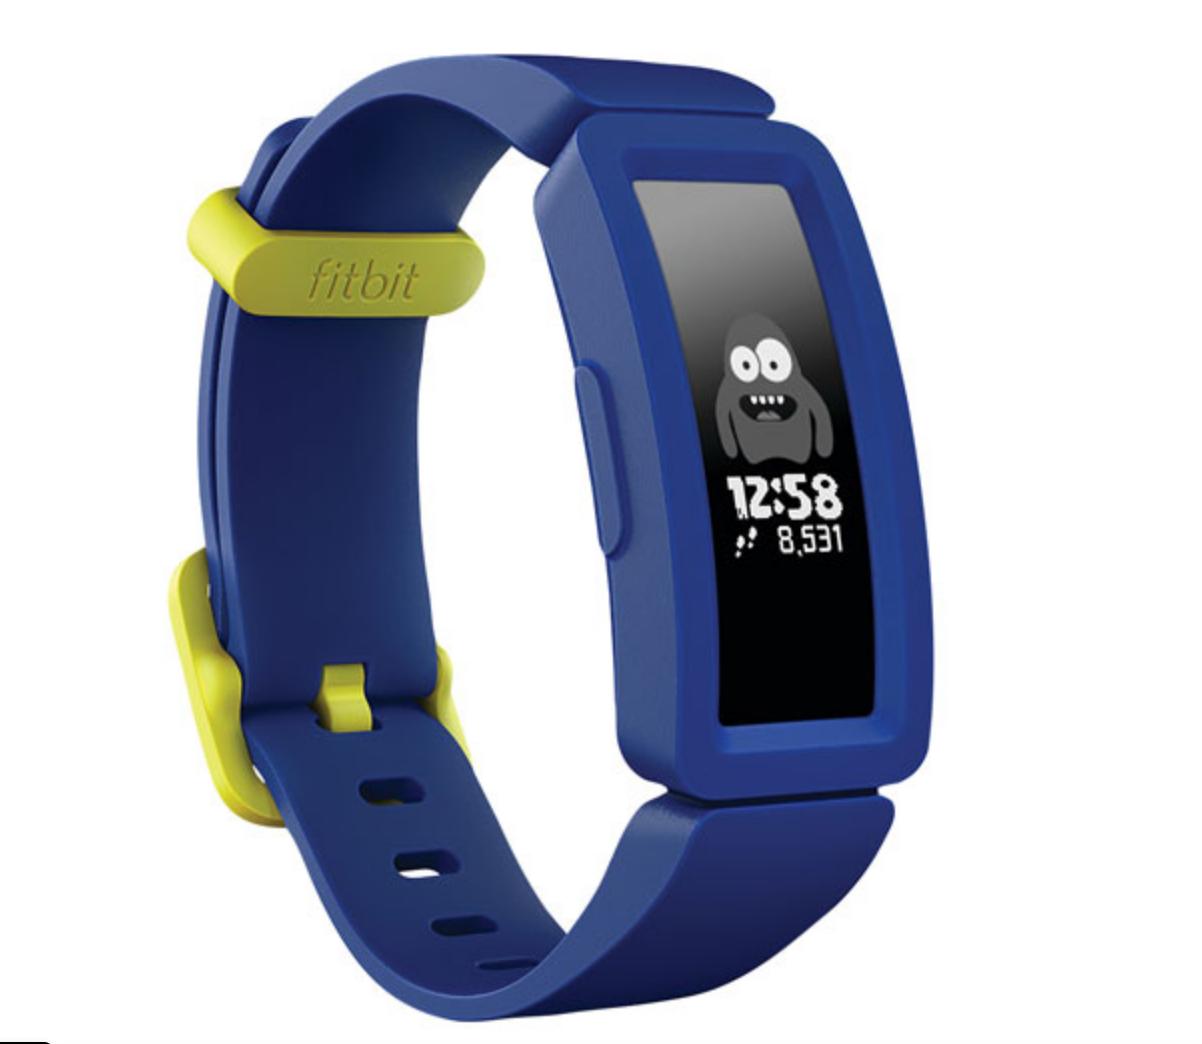 Fitbit Ace 2 Kid's fitness tracker